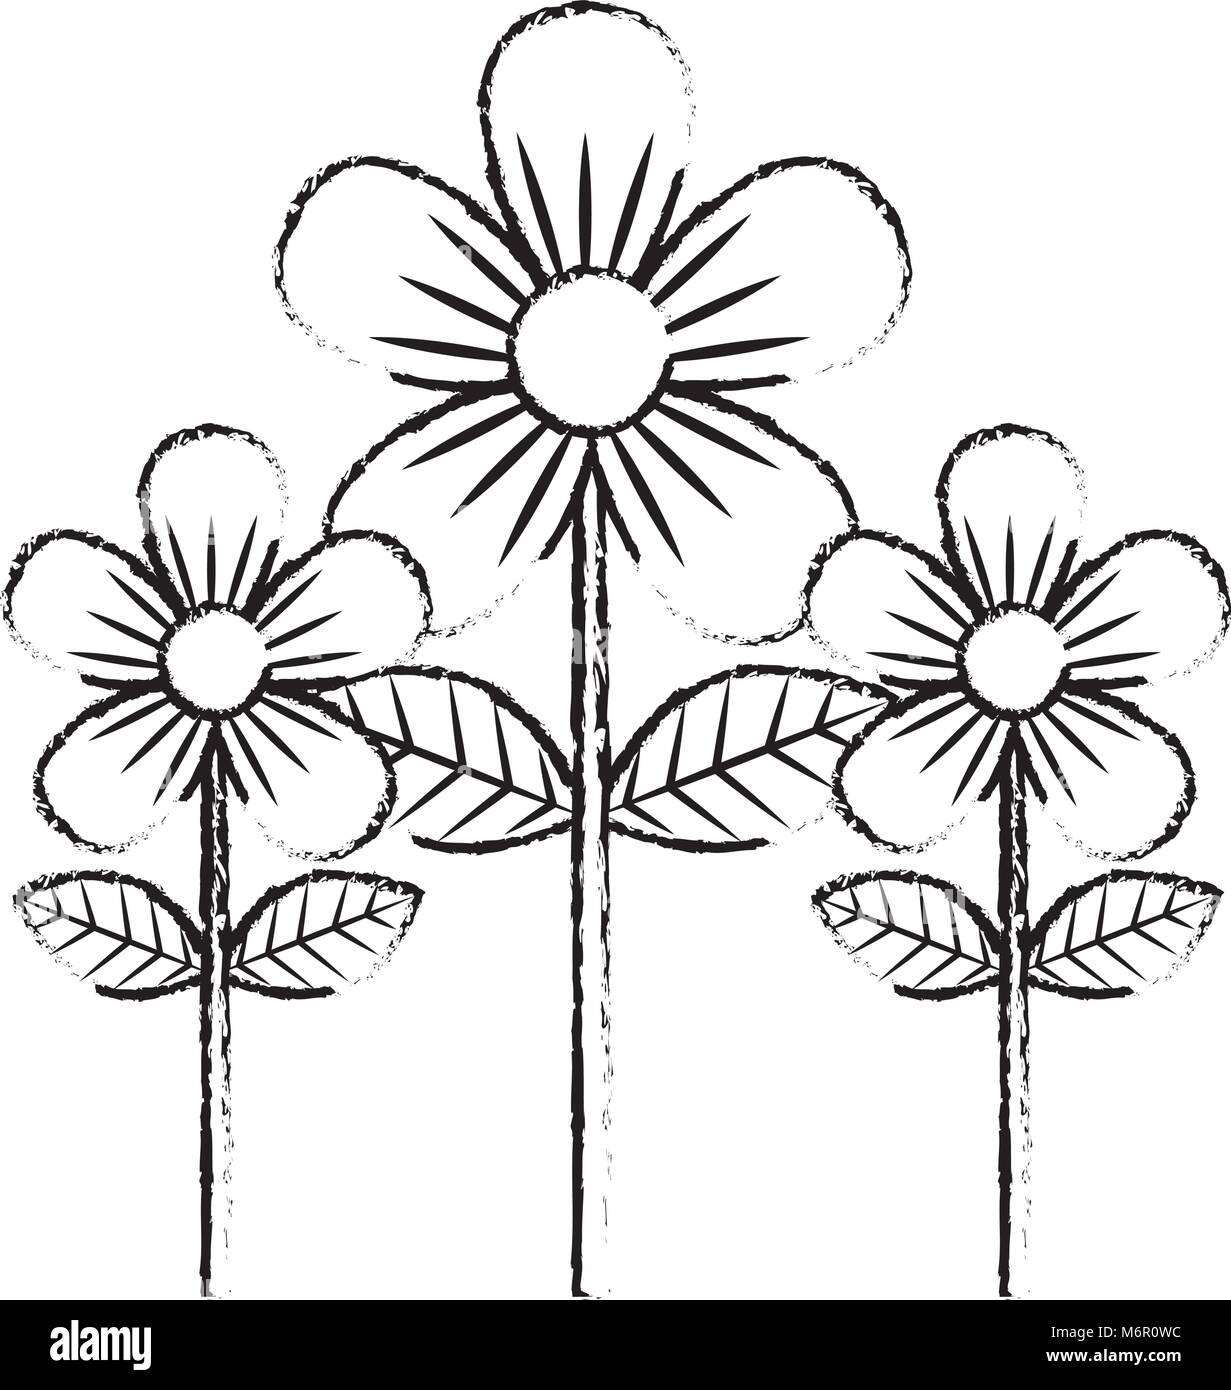 Beauty Flowers Decoration Leaves Stem Petals Vector Illustration Stock Vector Image Art Alamy